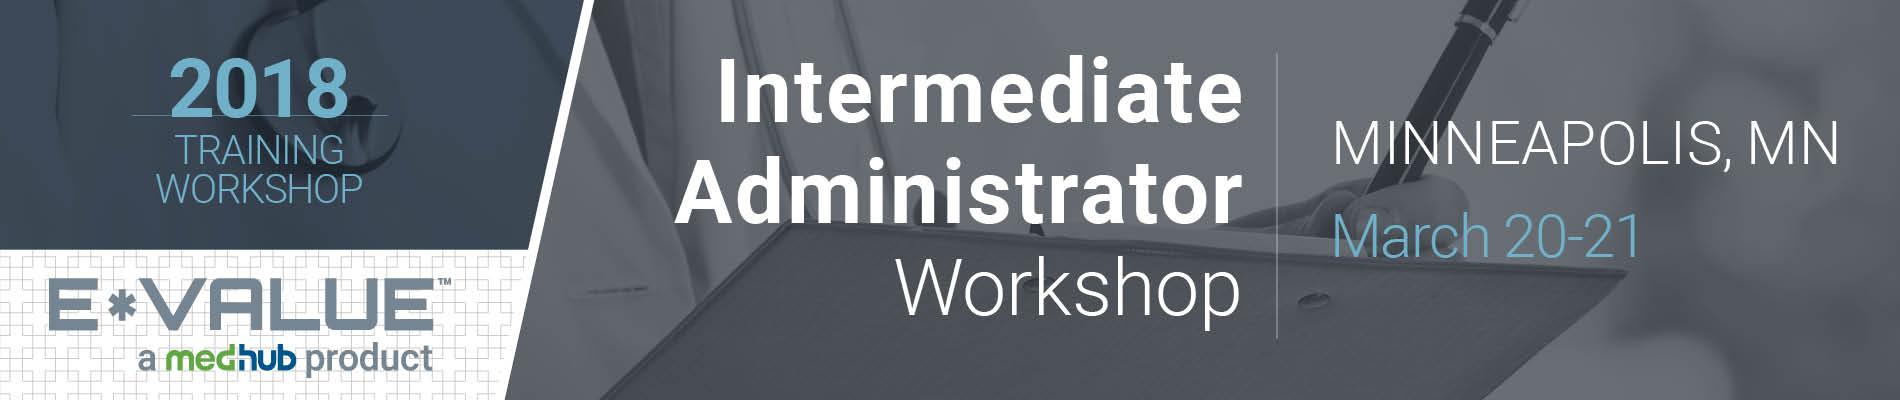 Intermediate E*Value Administrator Workshop (March 20-21)